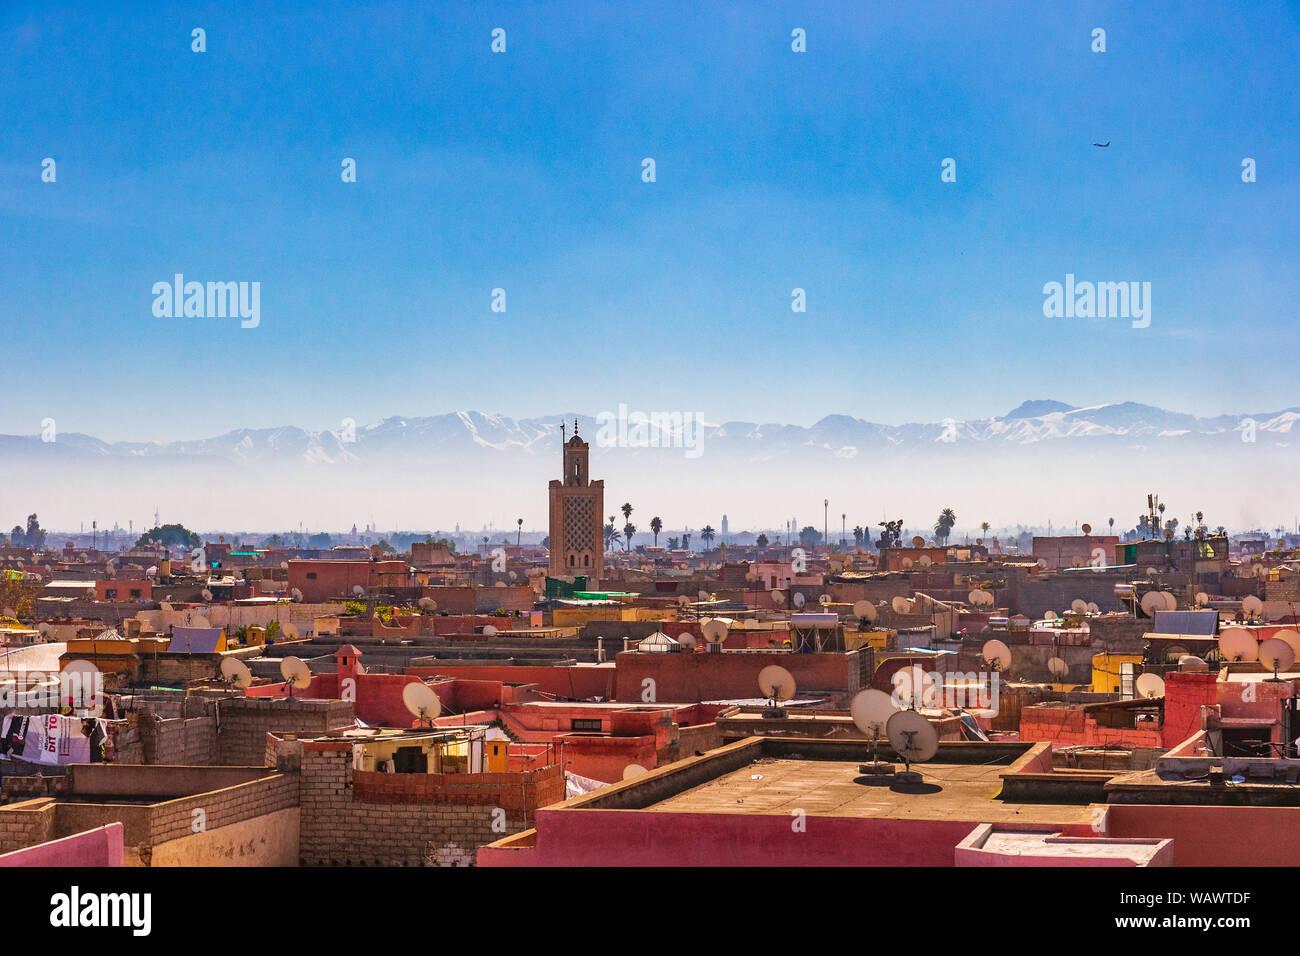 A Panoramic view of Marrakesh old town Medina Stock Photo